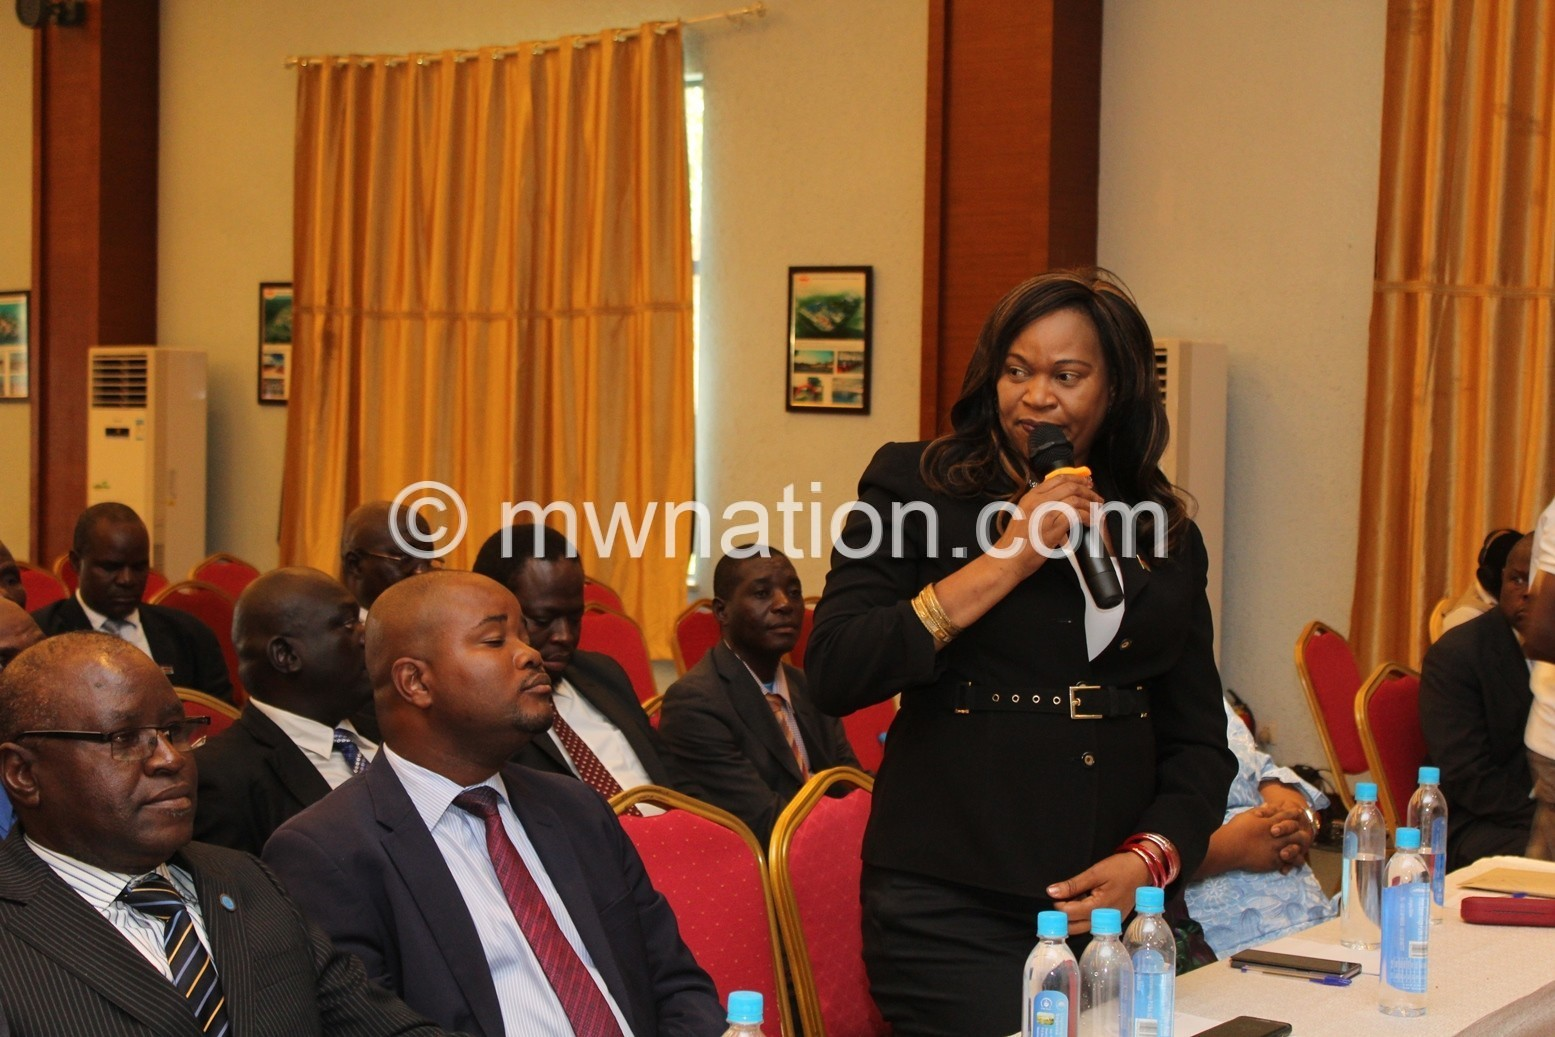 Lilongwe DPP MPs 2  mcheka chilima   The Nation Online